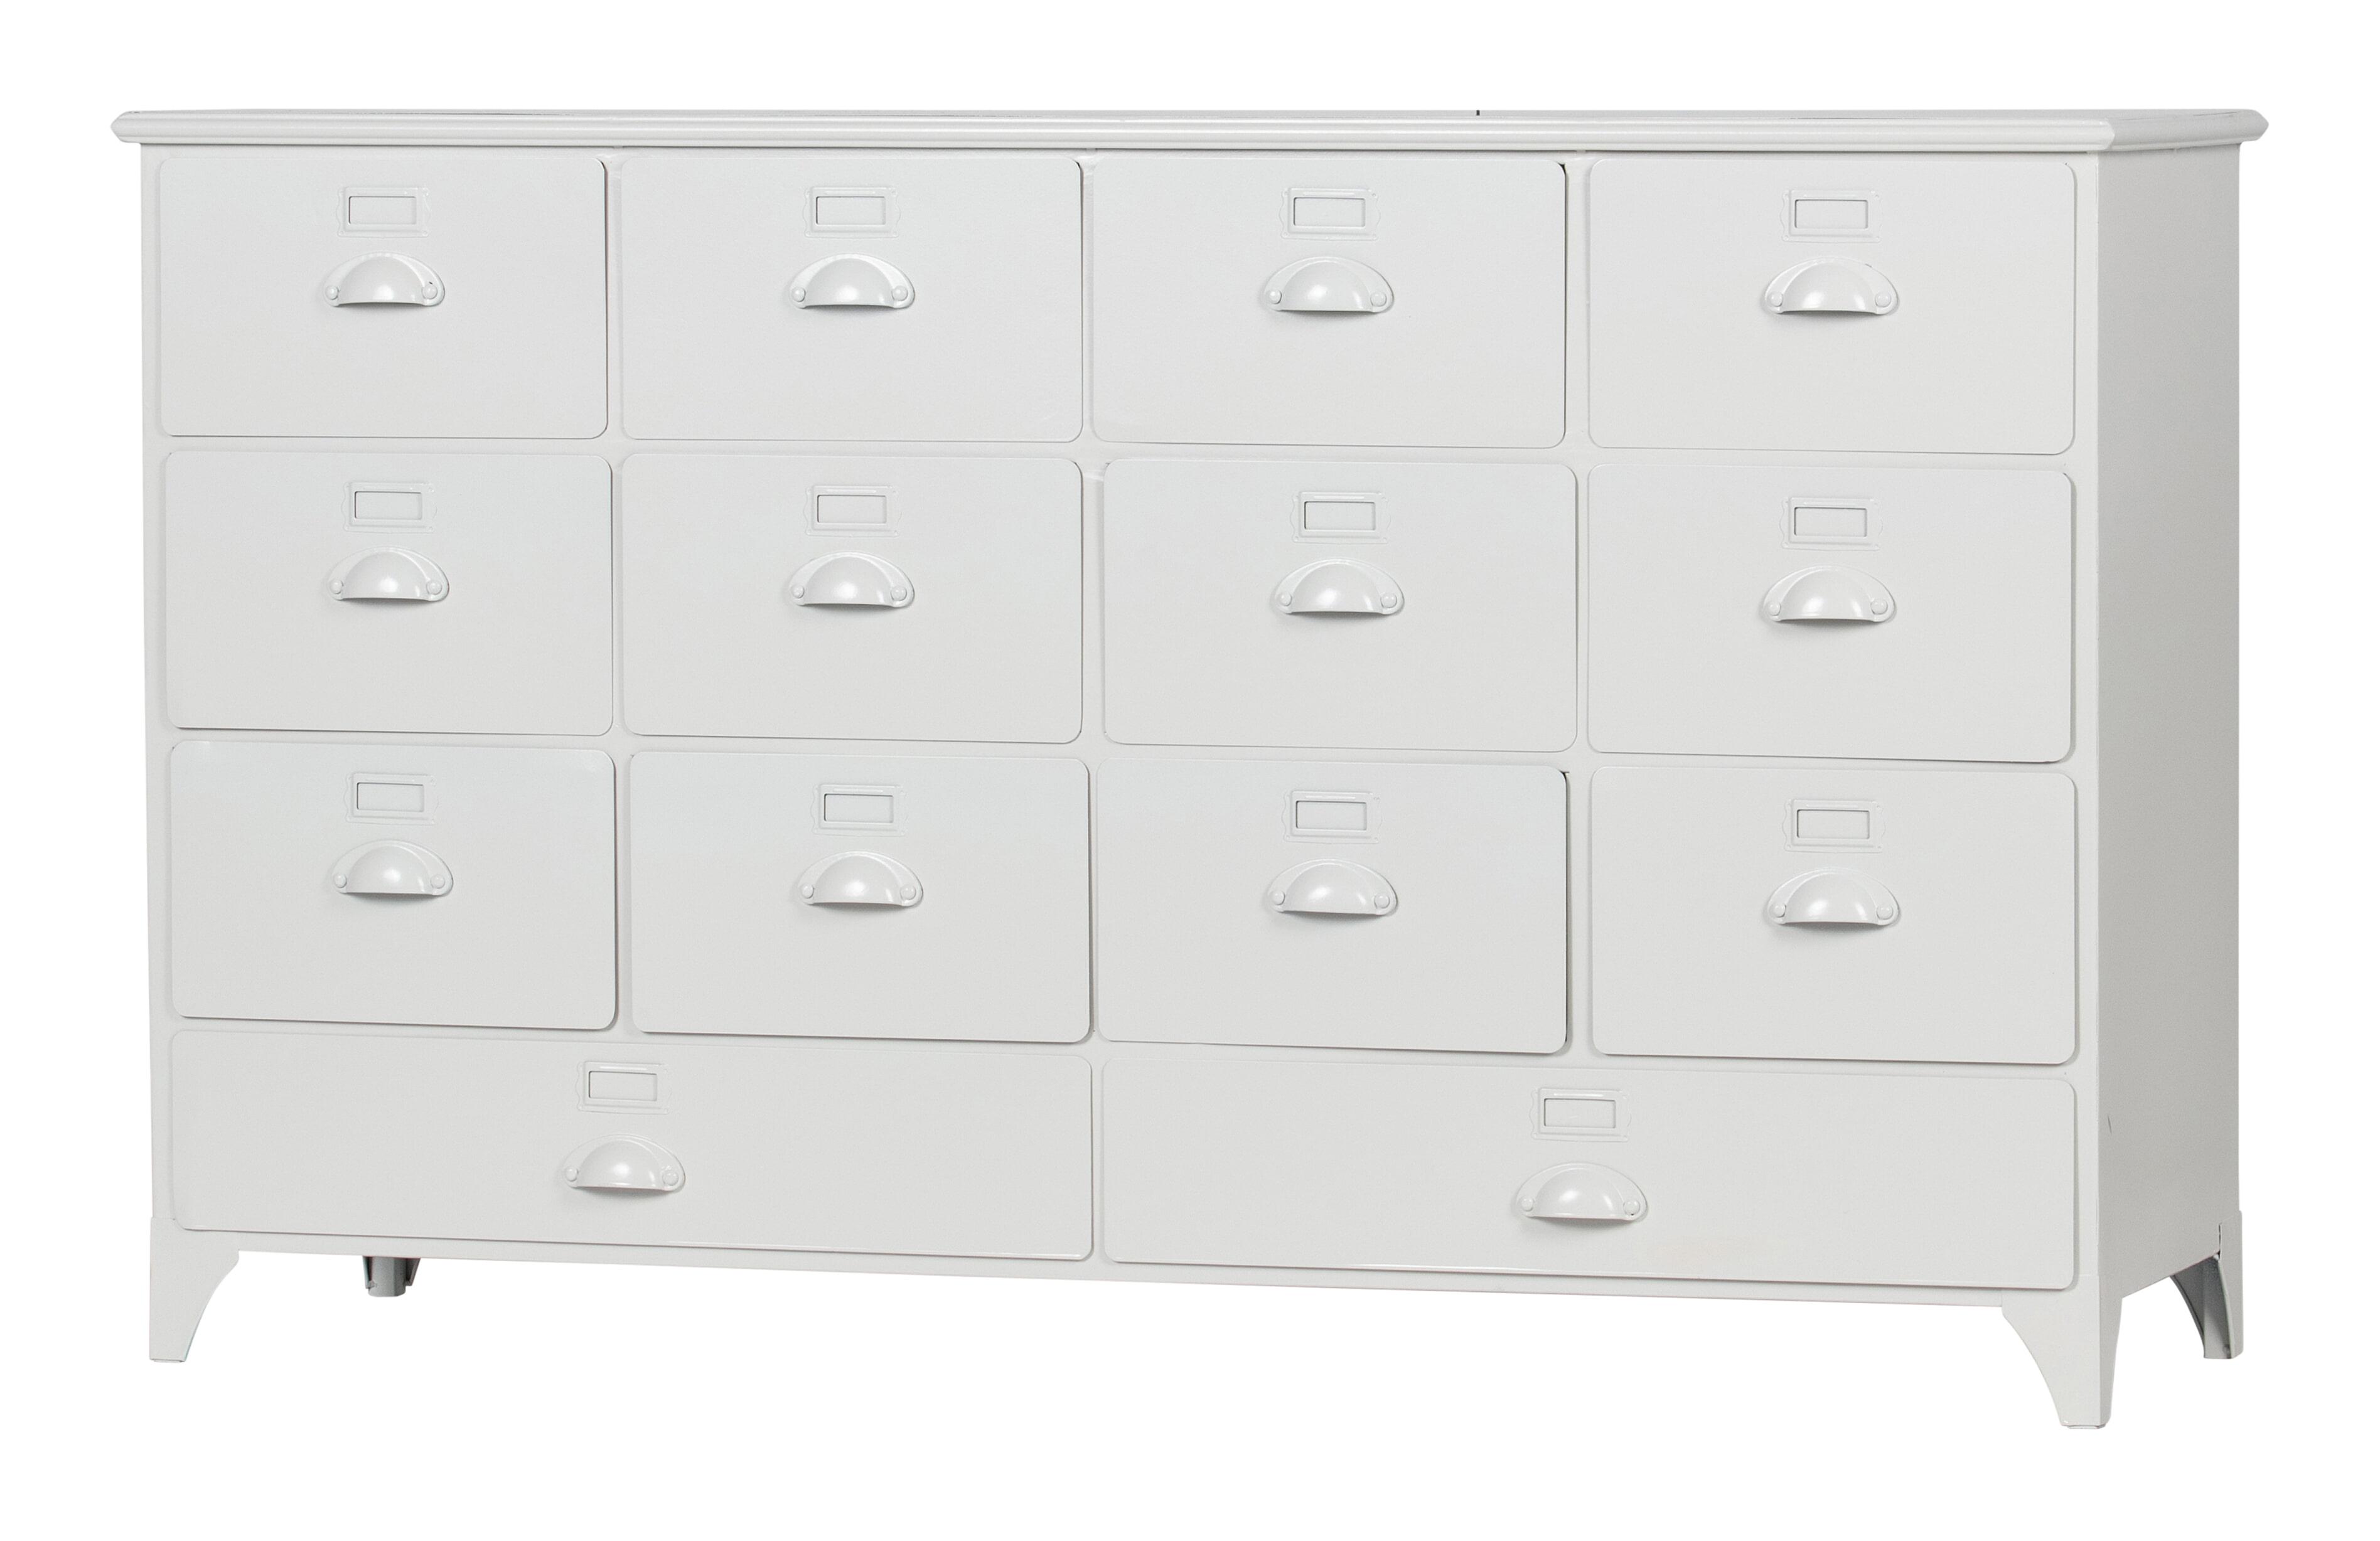 vtwonen Ladenkast 'Archive', kleur Wit